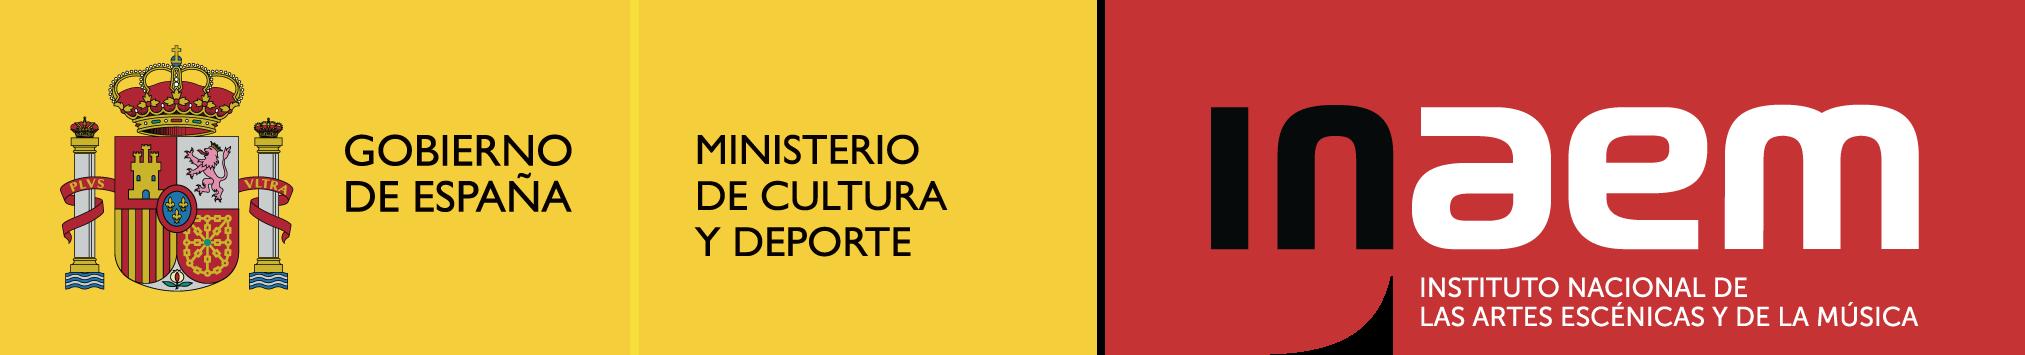 Logo per programes color - Ministerio de Cultura y deporte - Inaem